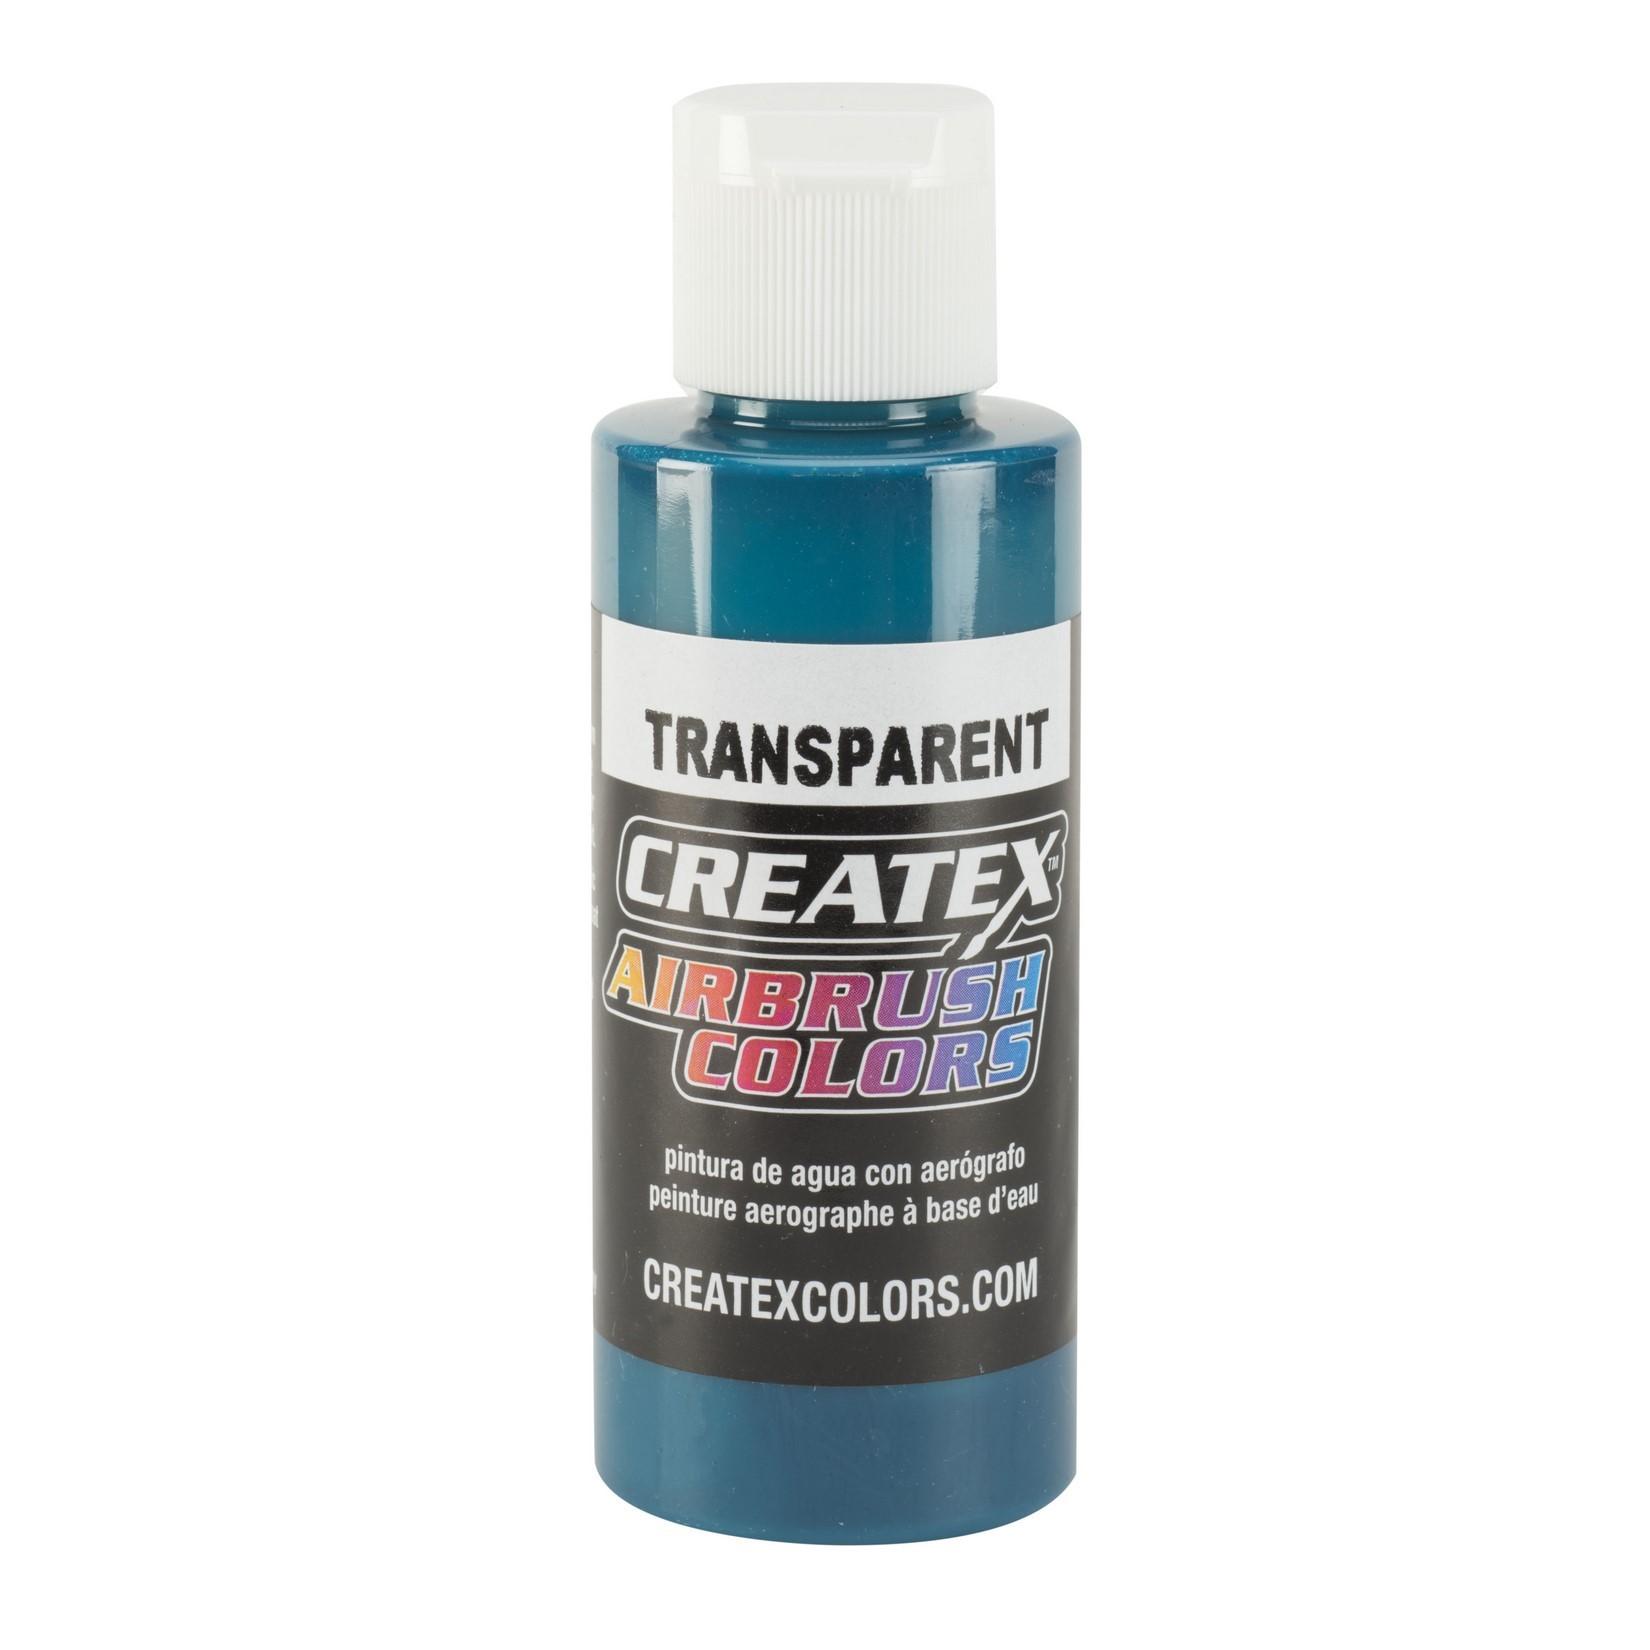 Wasserblau Createx Airbrush Colors Farbe 240ml 13 5111 Createx